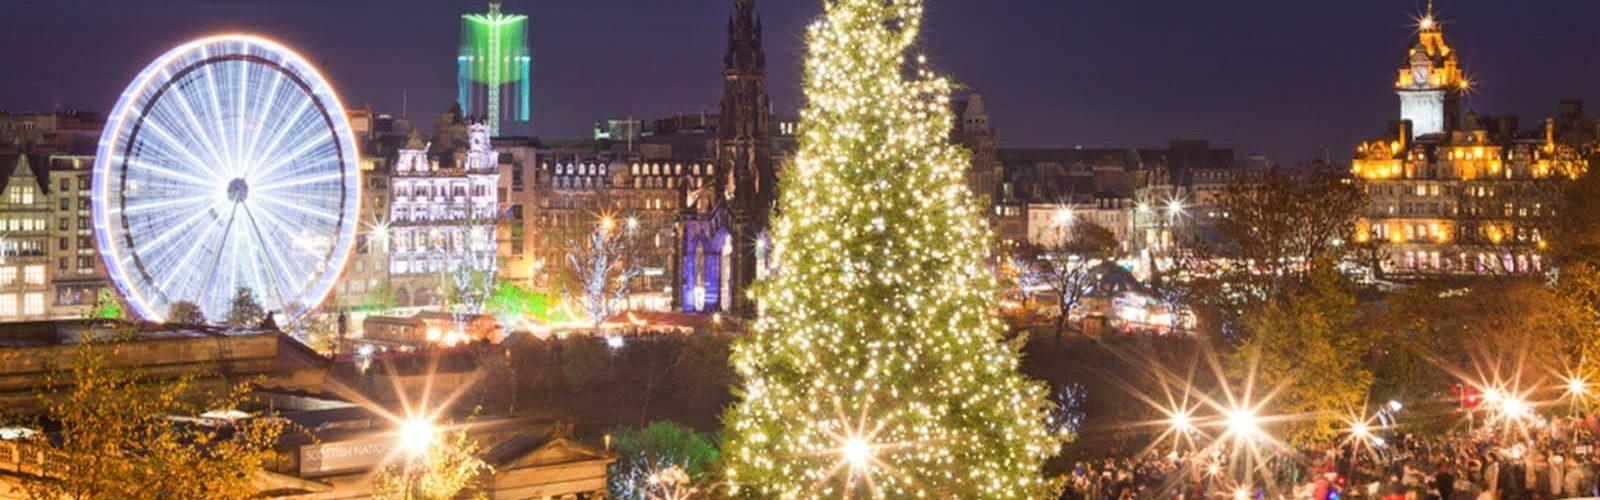 Edinburgh at Christmas time